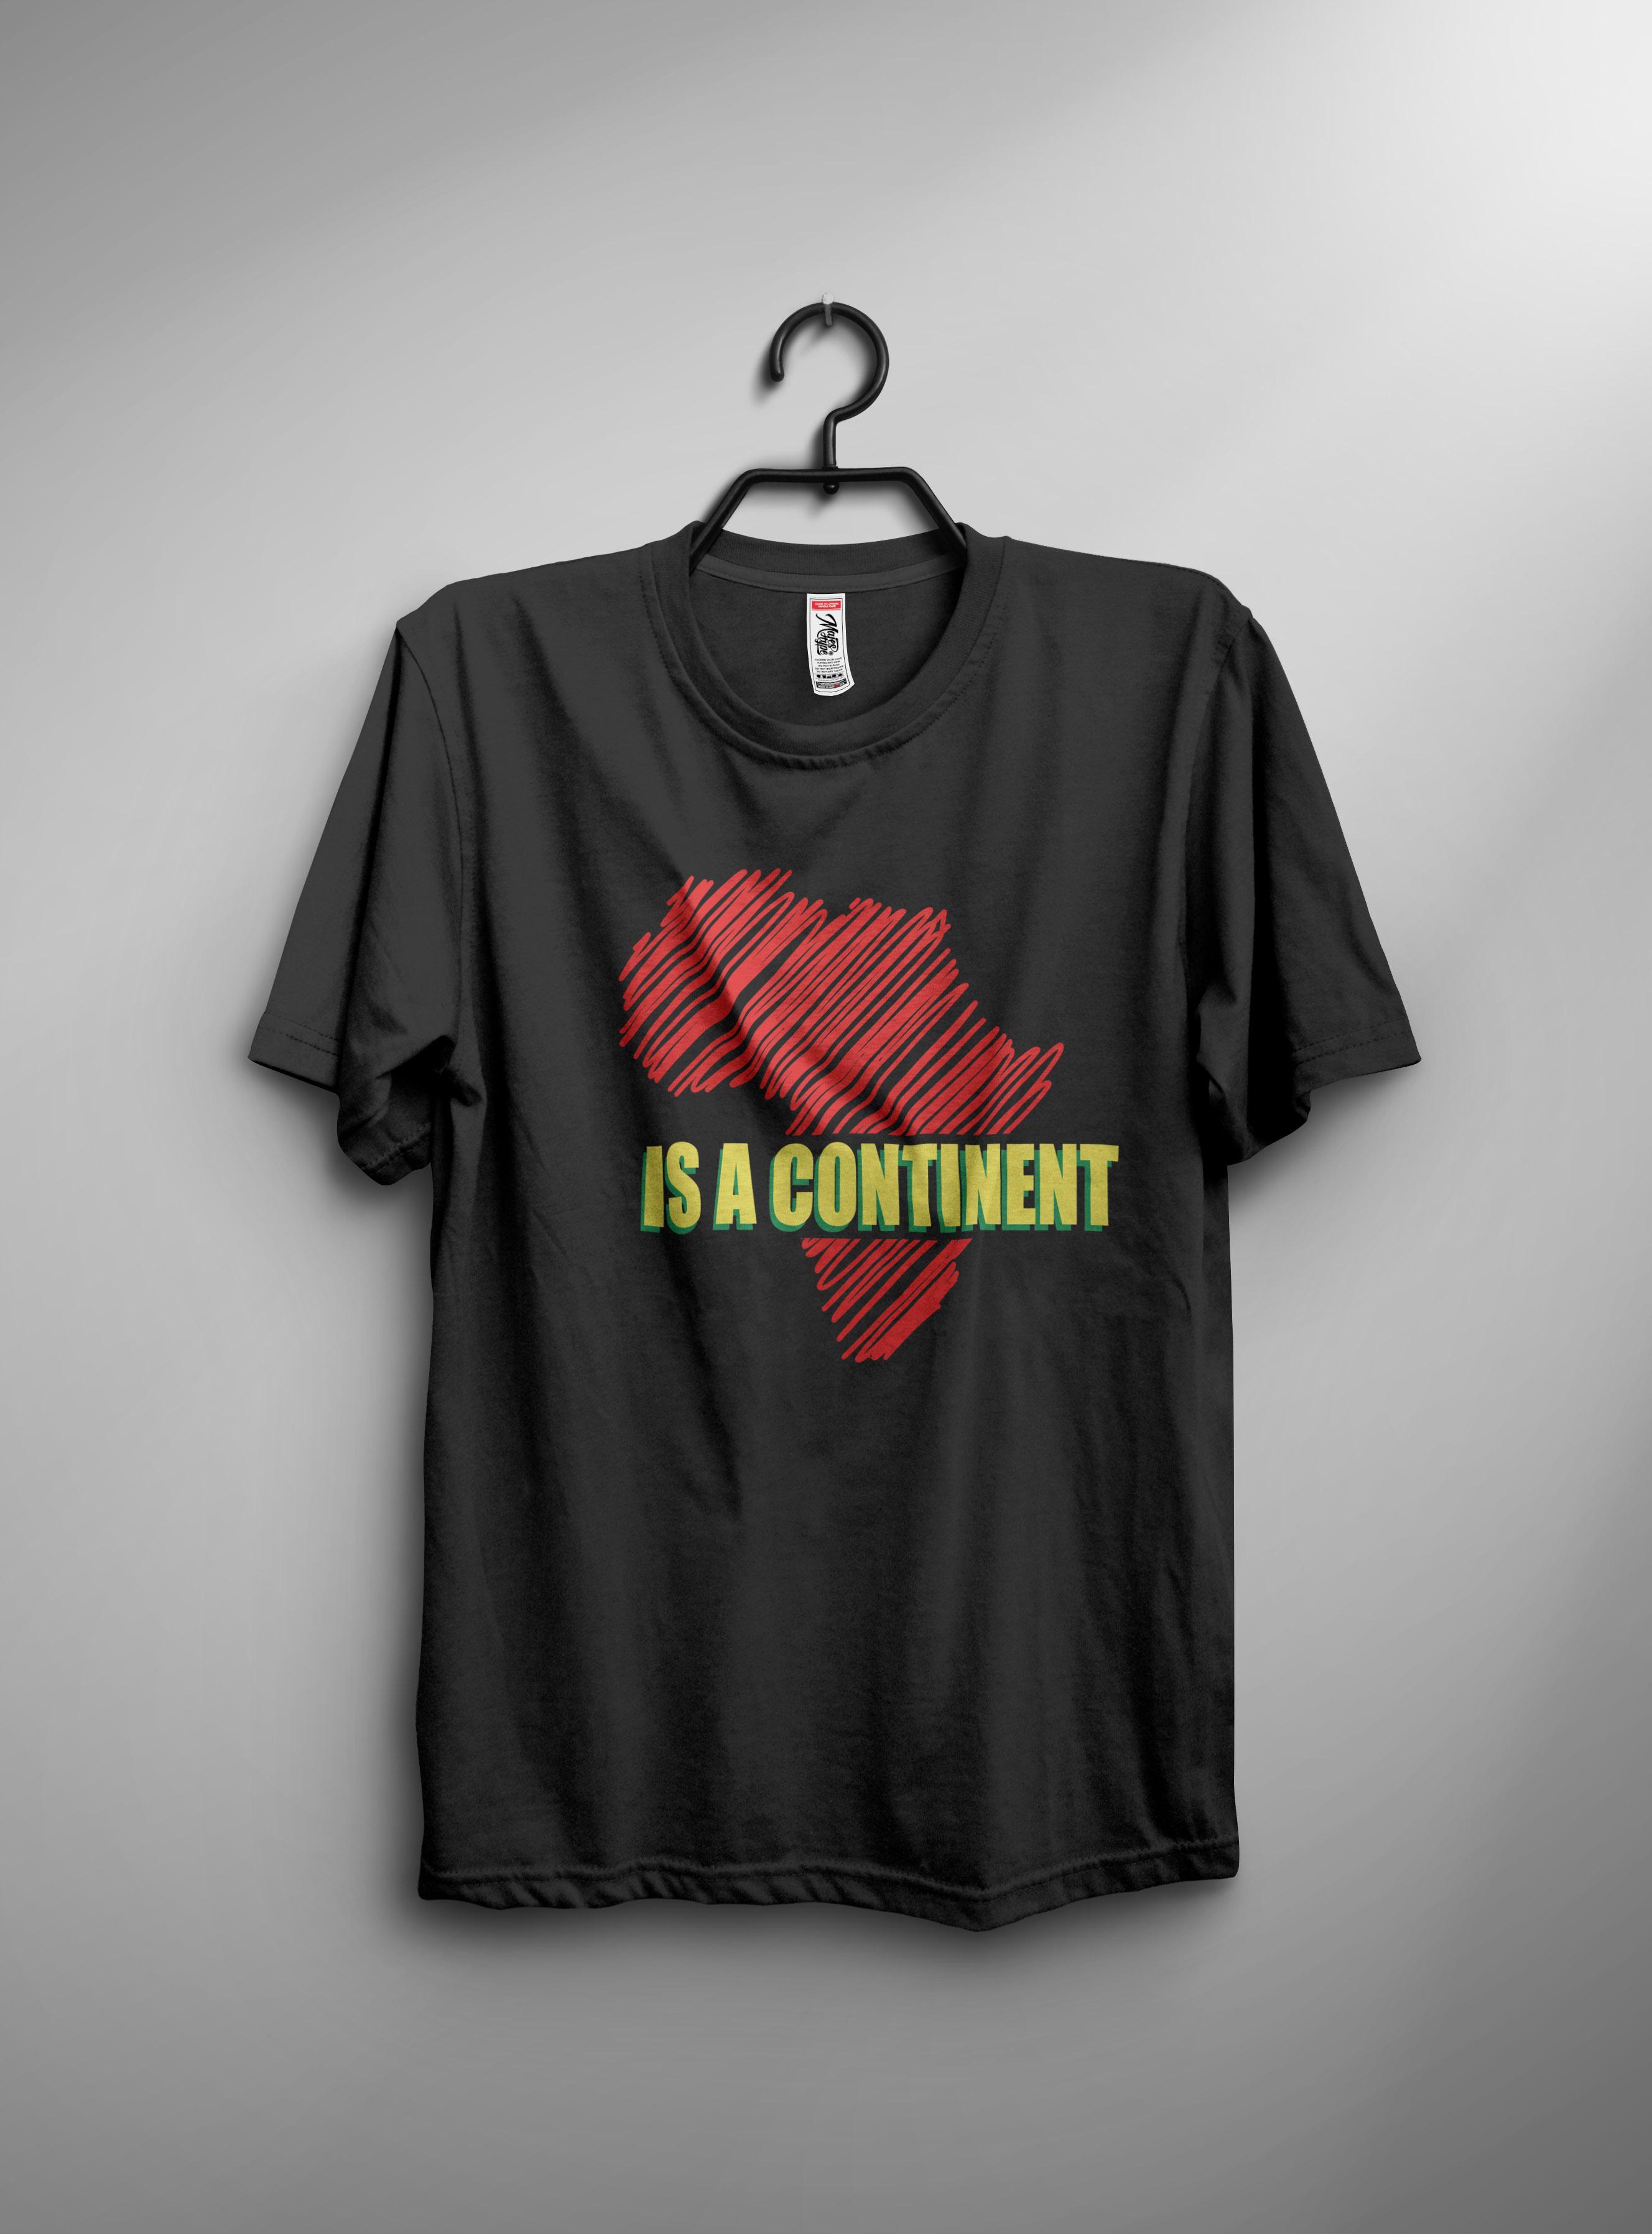 I will create enhanced,edge custom t shirt design